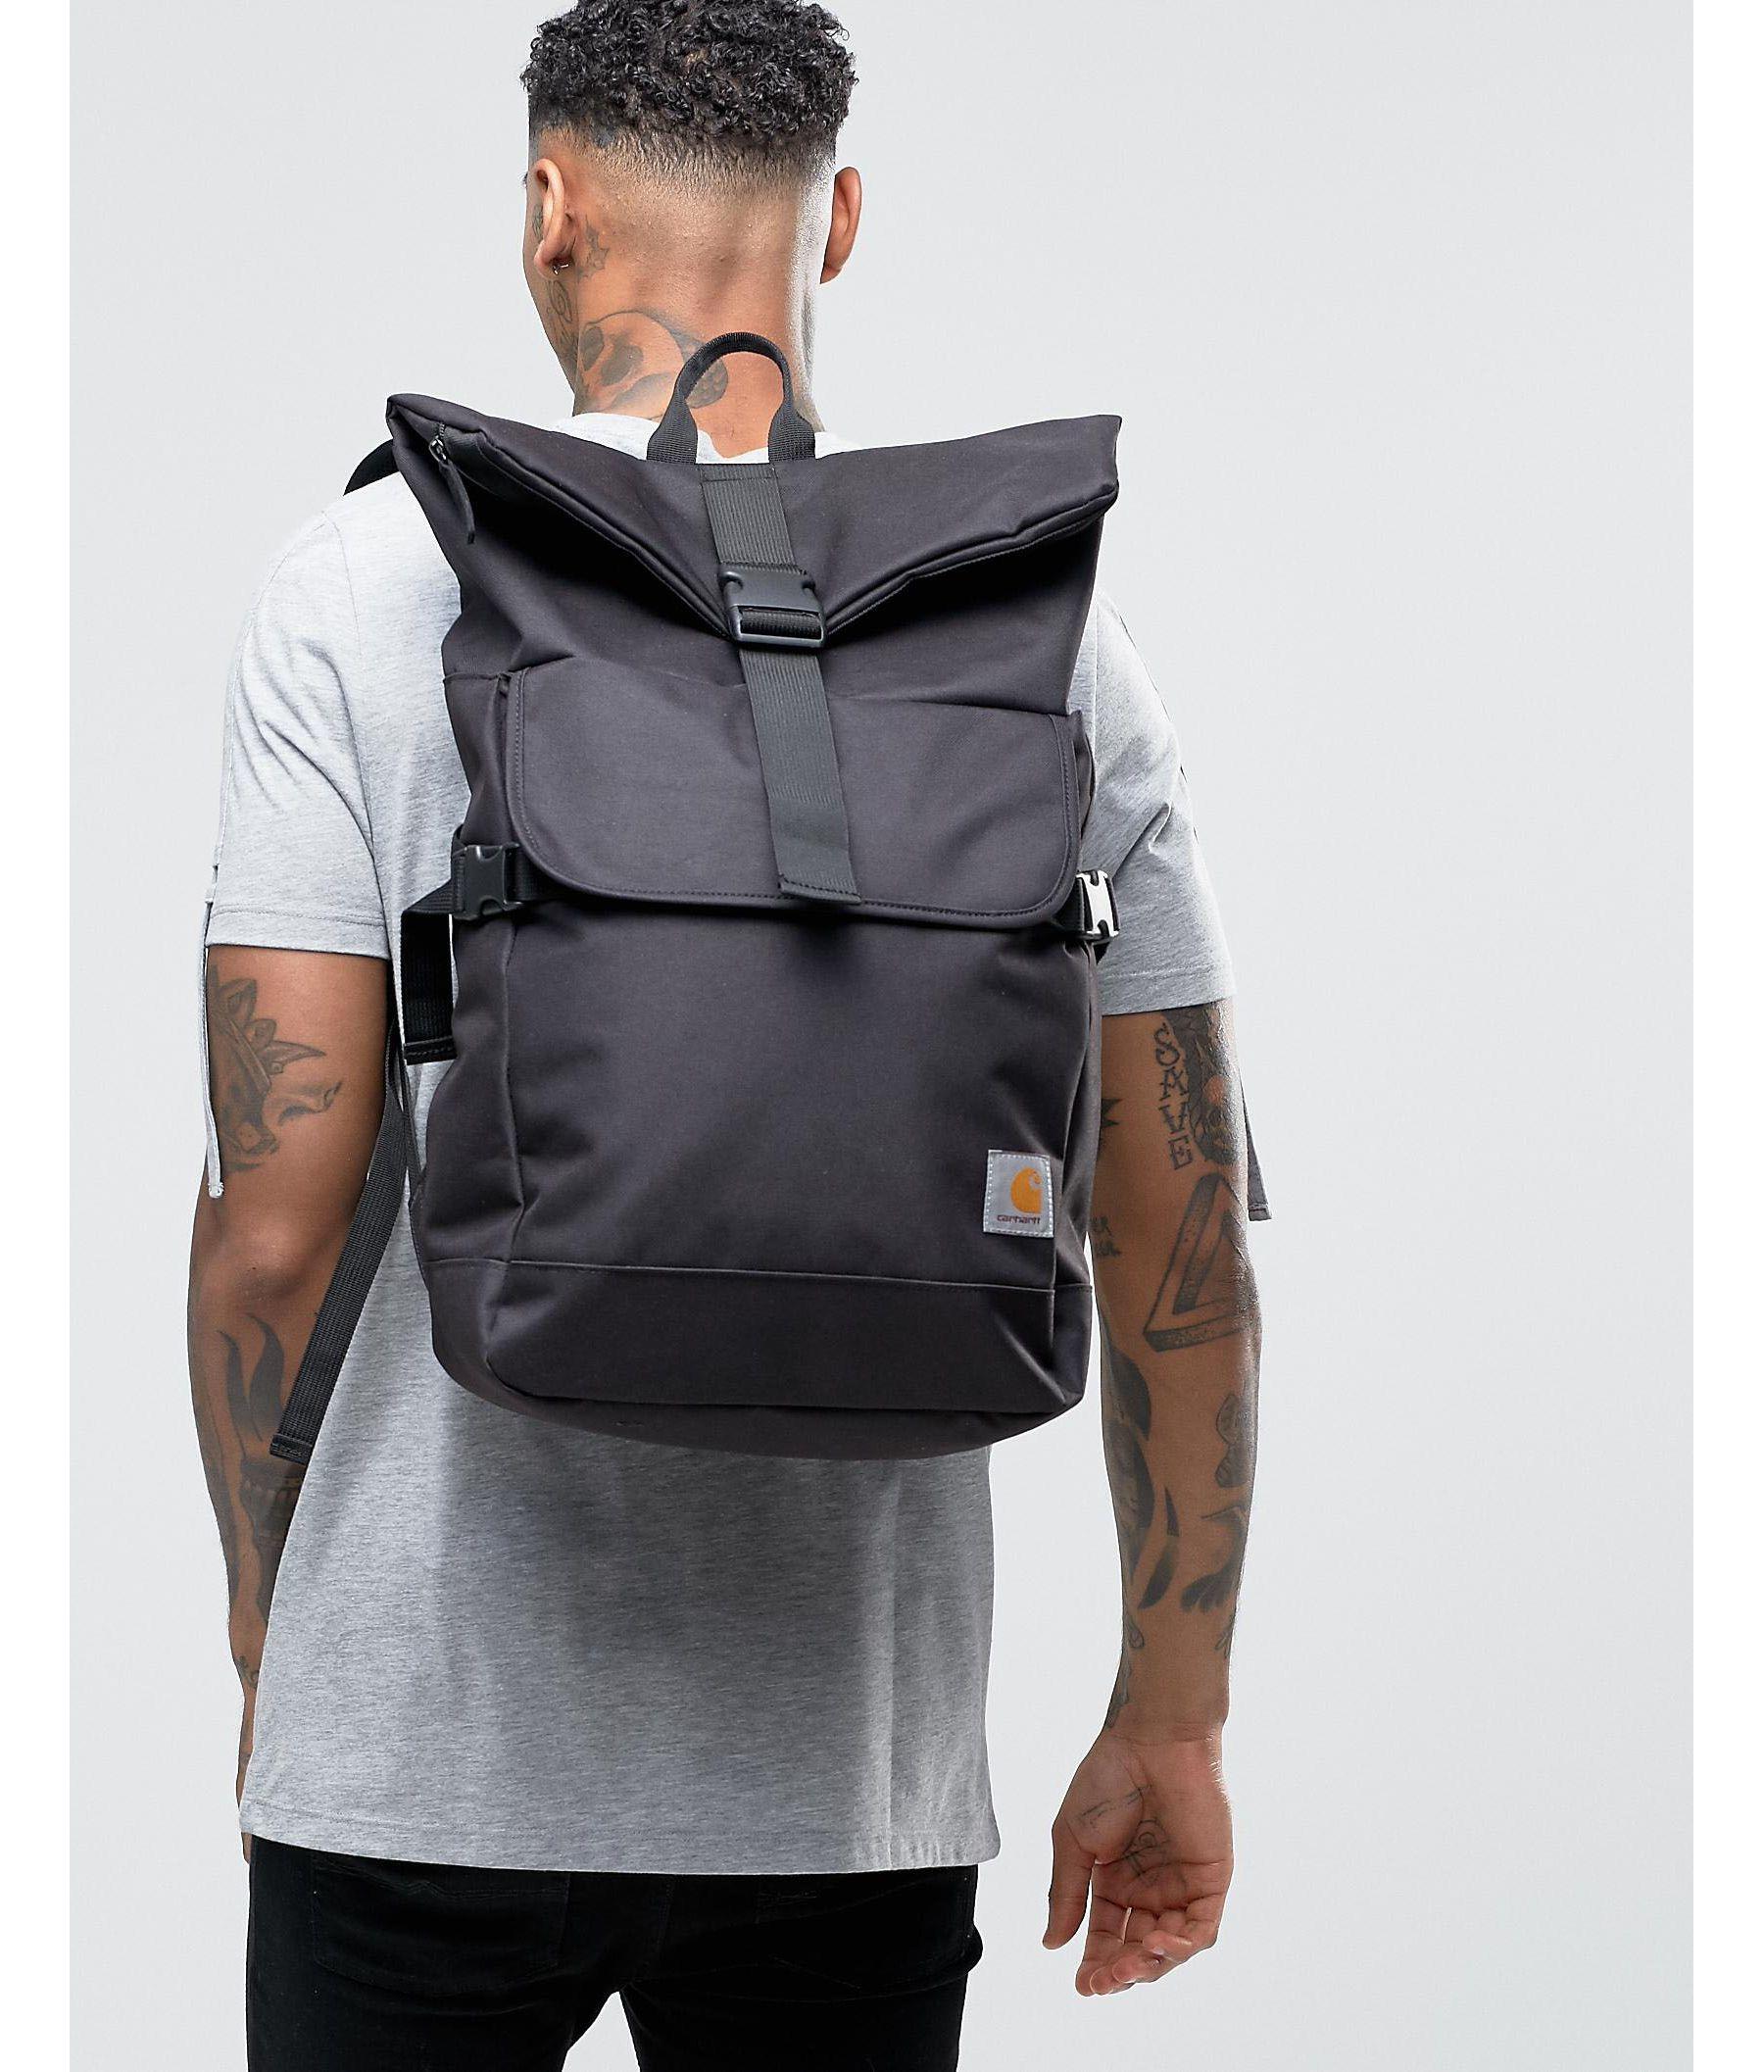 Lyst - Carhartt WIP Backpack Philips in Black for Men